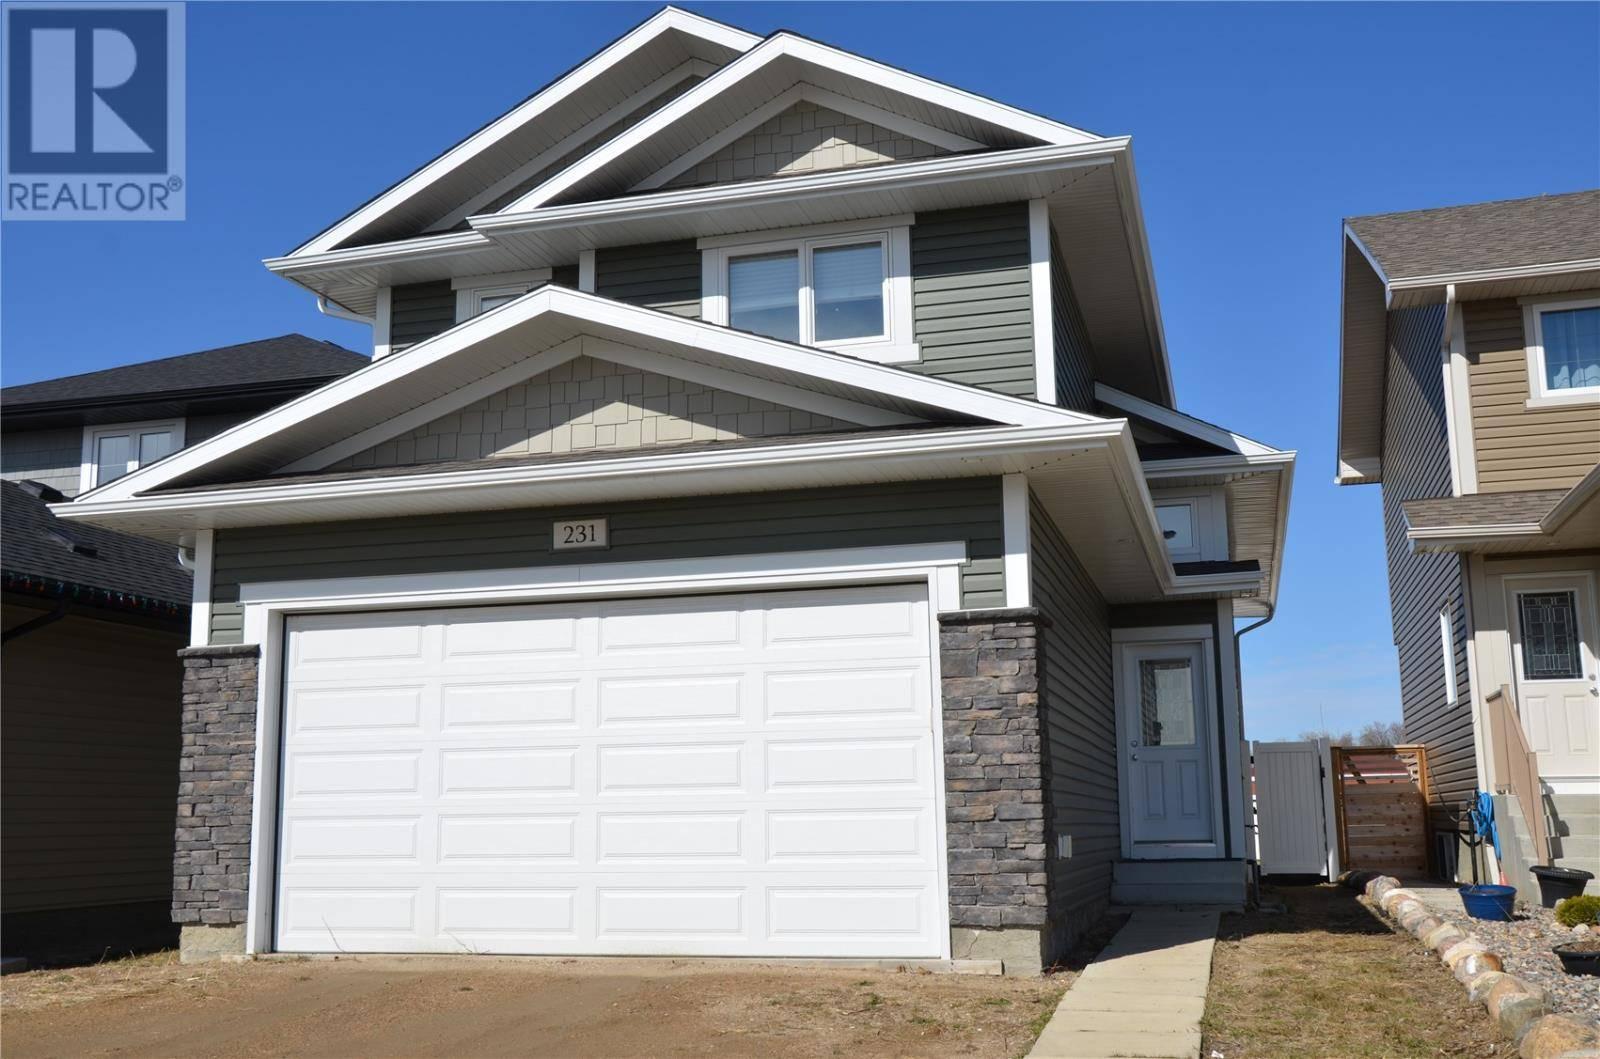 House for sale at 231 Wall St Dalmeny Saskatchewan - MLS: SK771401